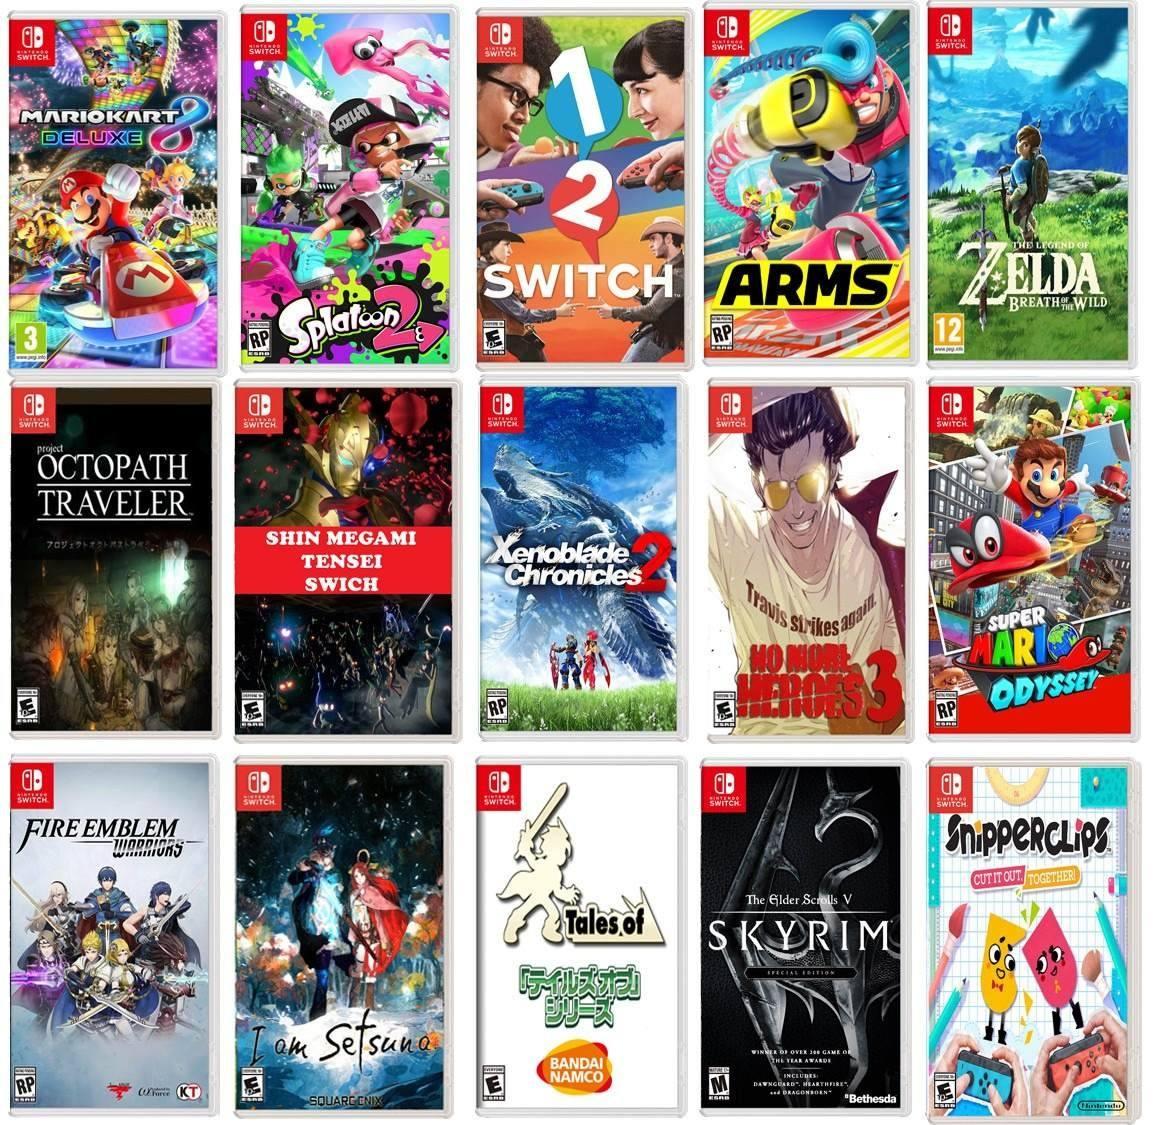 Juegos Para Nintendo Switch Todos Evergames Obelisco 900 00 En